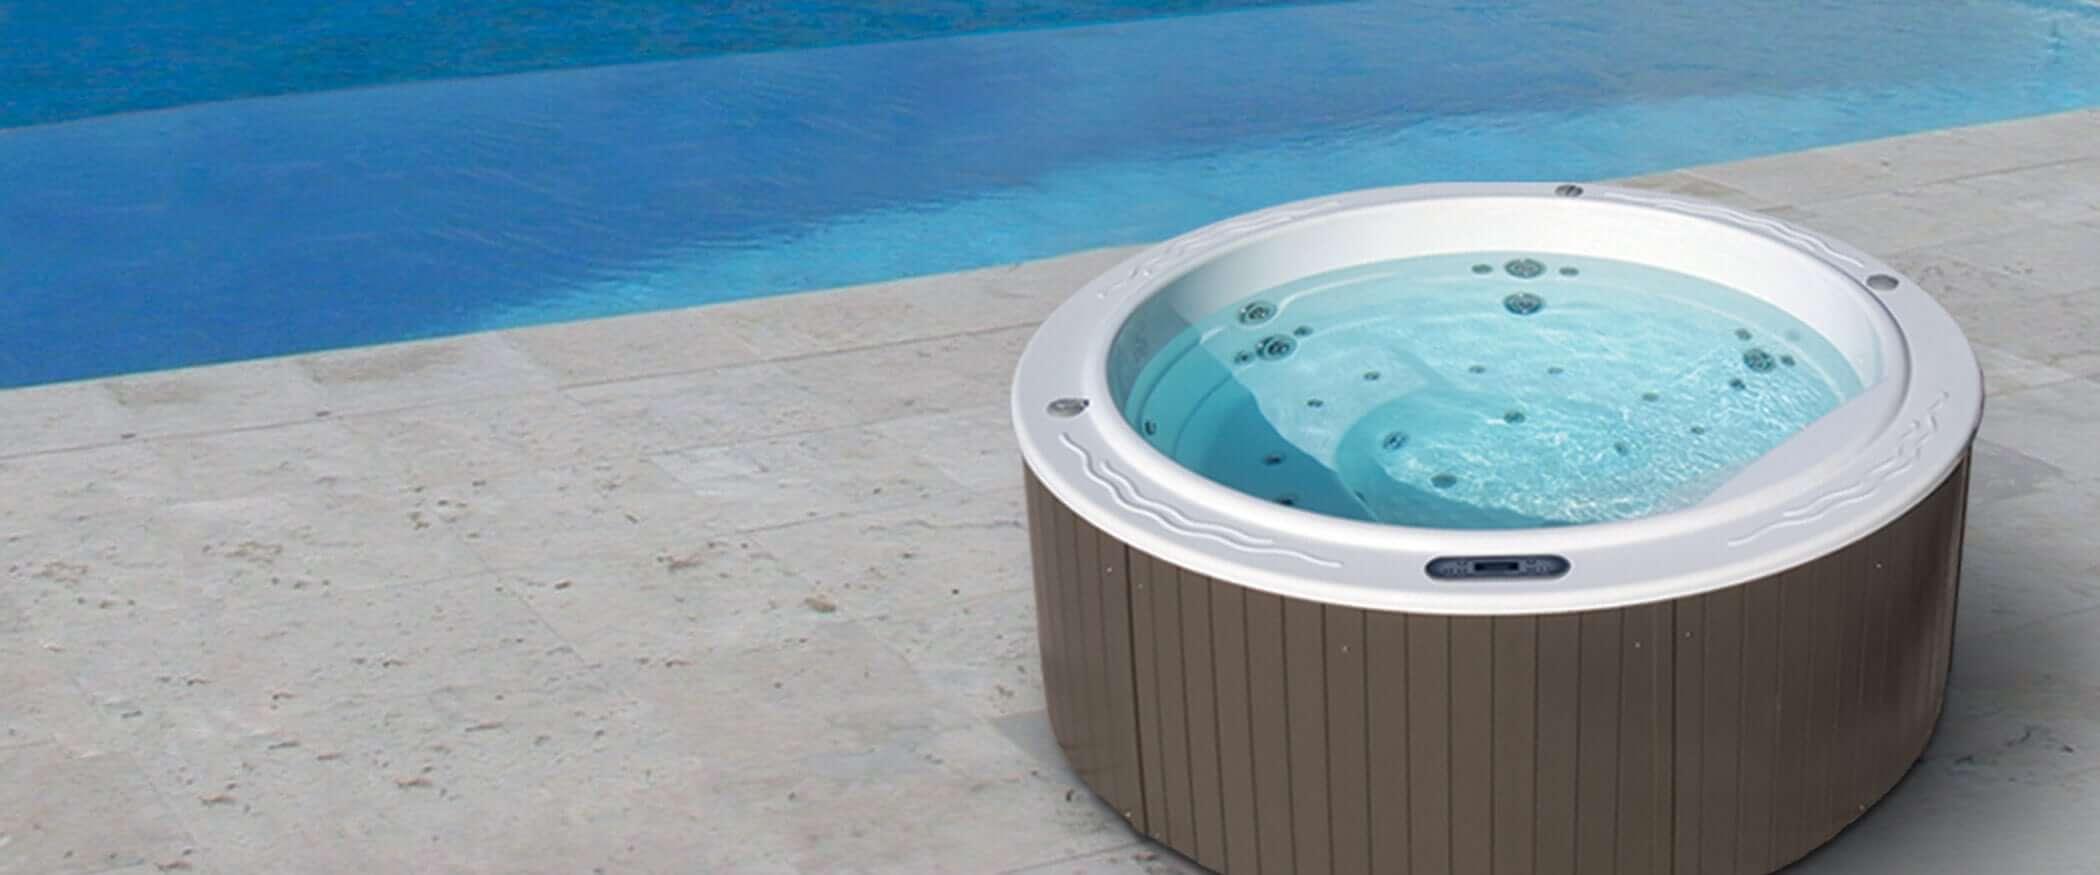 Jacuzzi Balboa 2 Places.Buy The Round Hot Tub Sundown Aquavia Spa